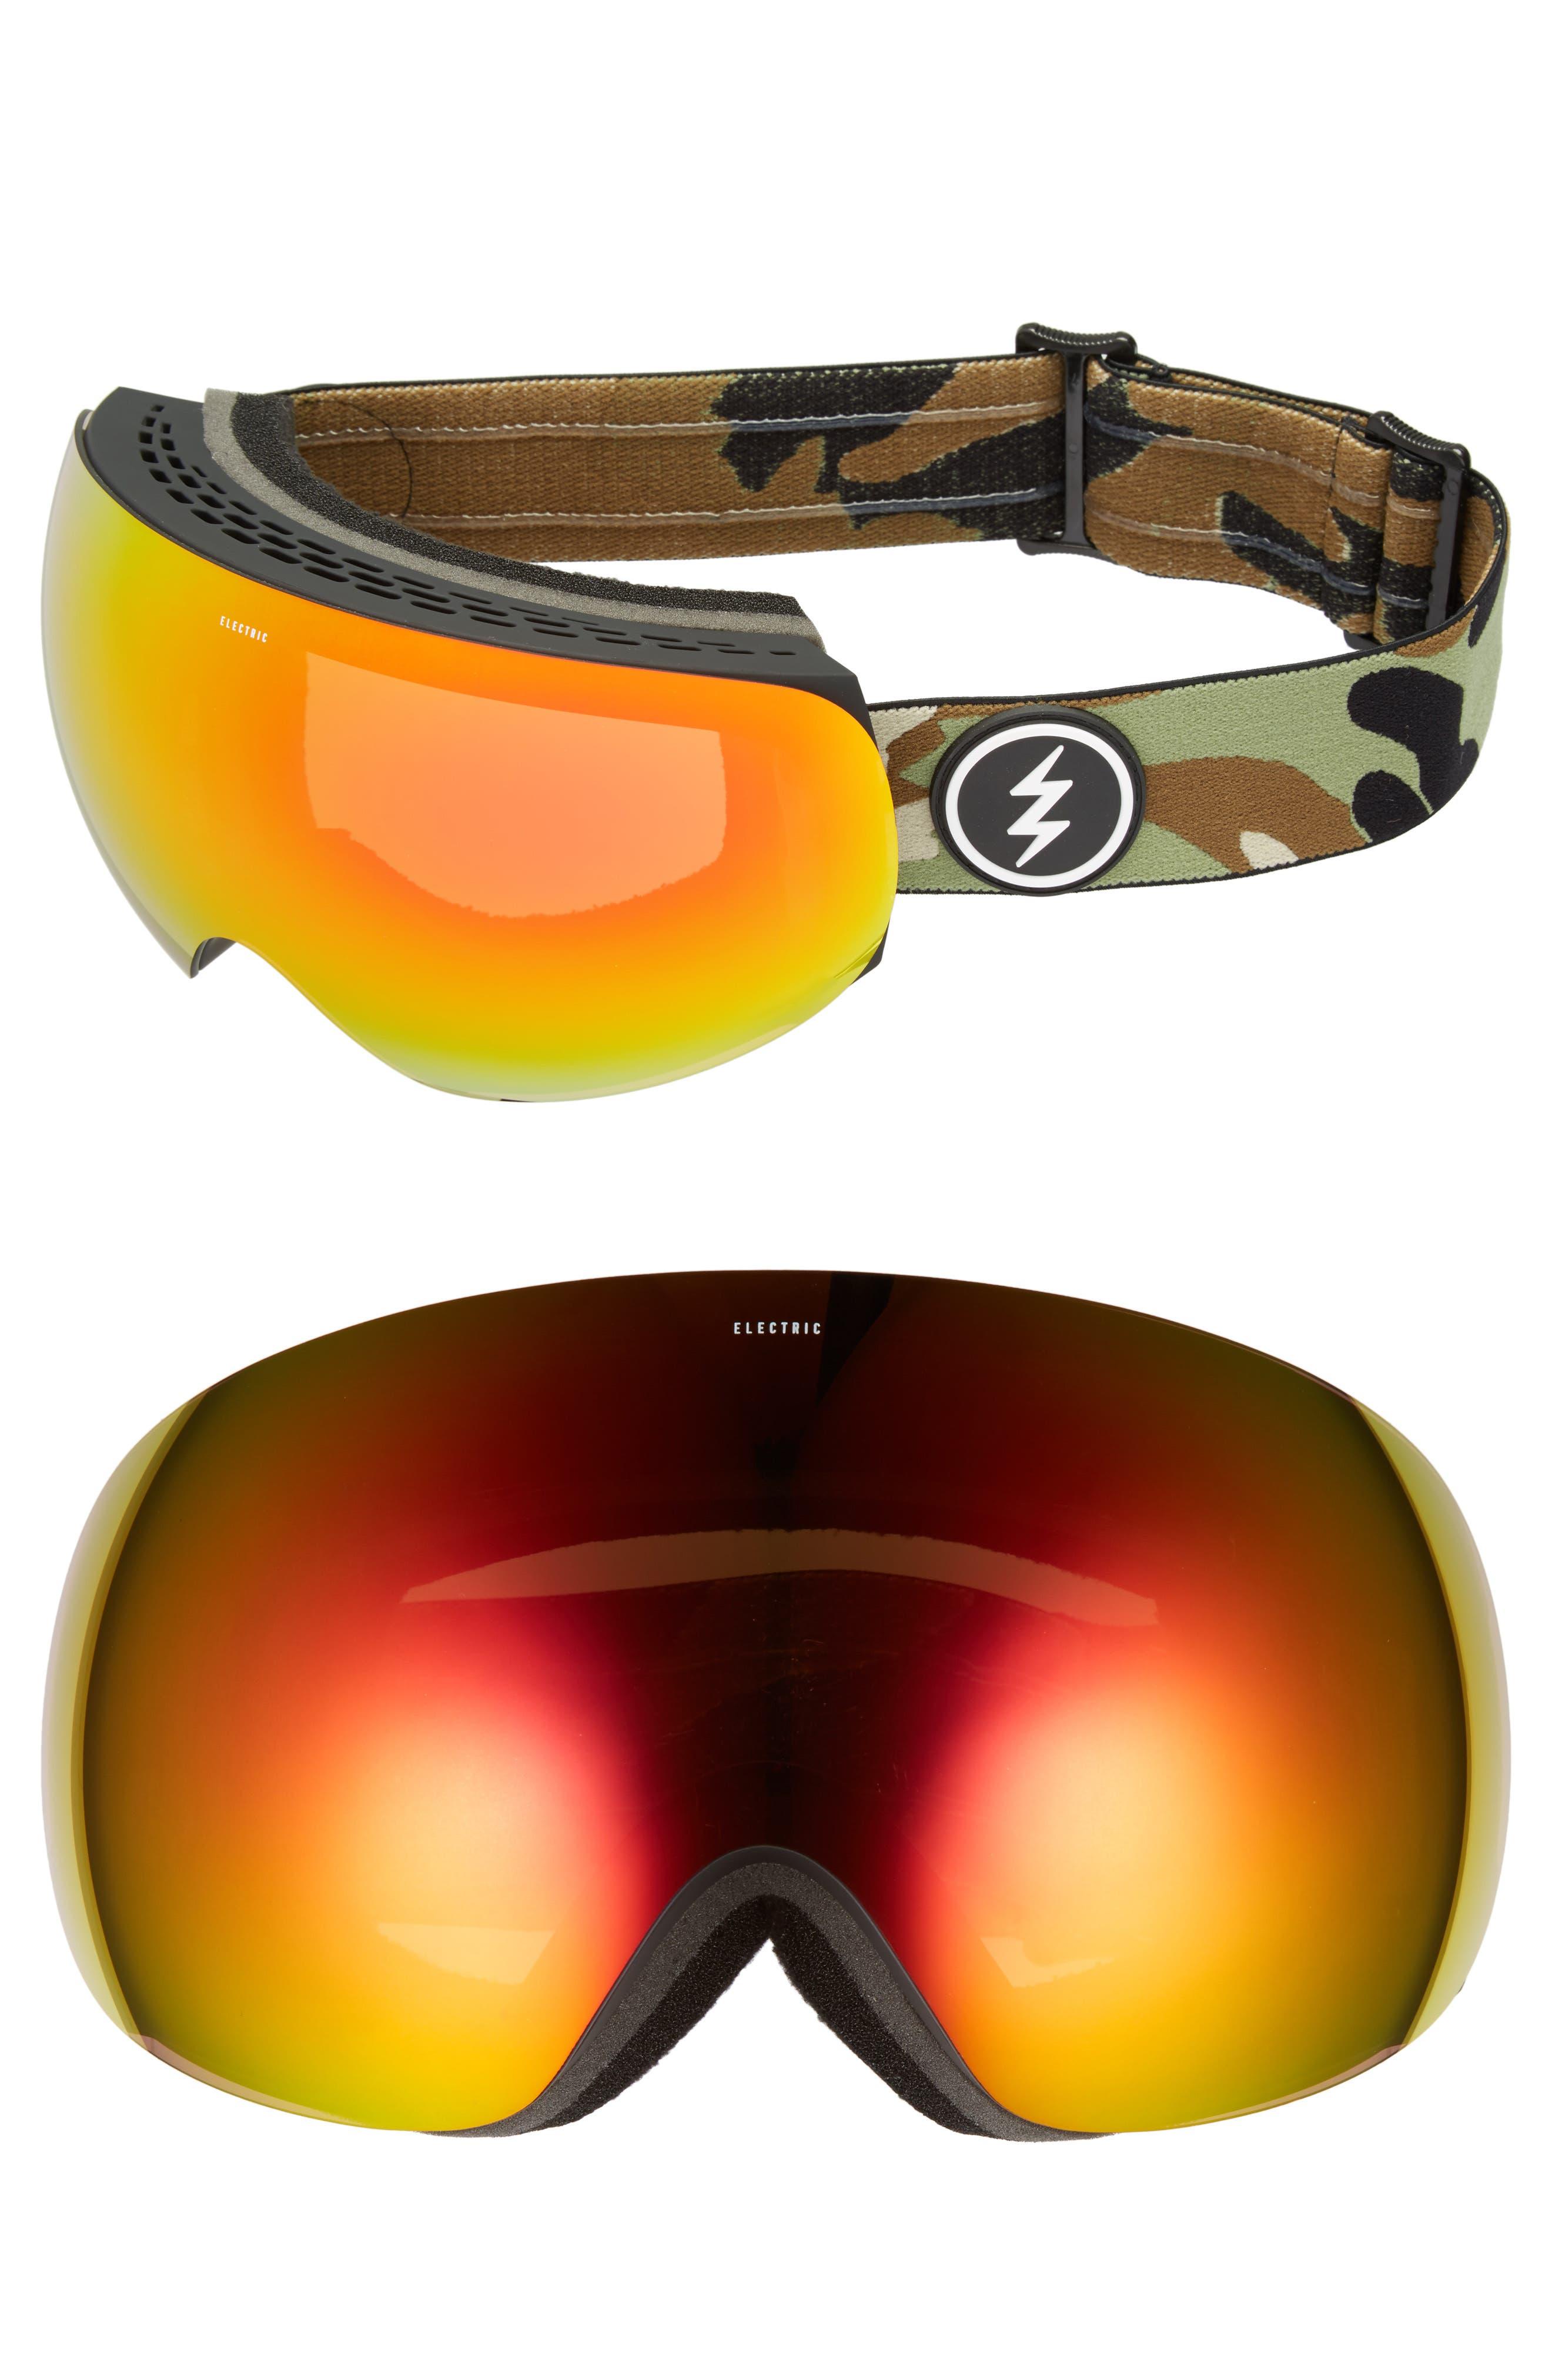 ELECTRIC EG3 Snow Goggles